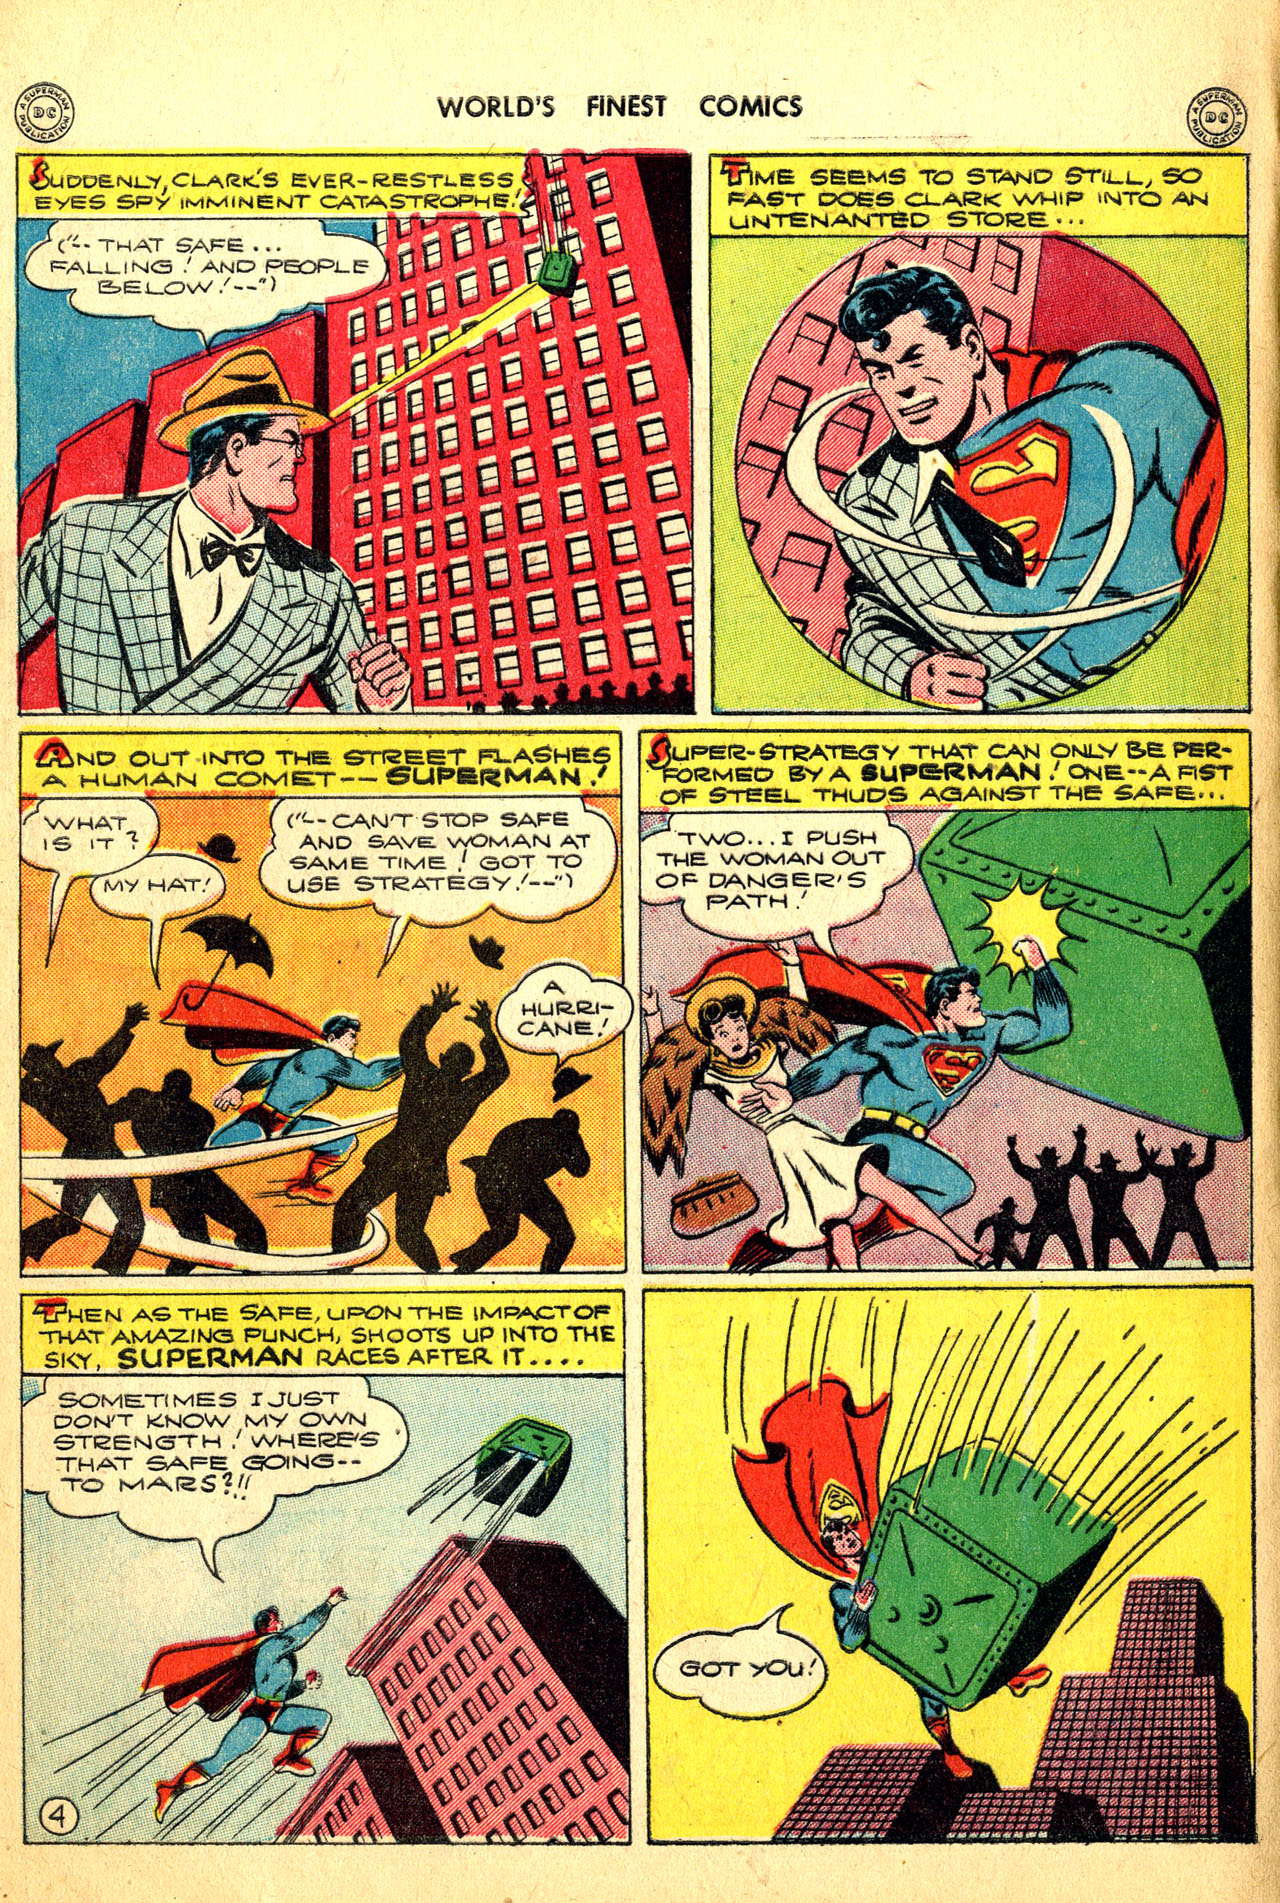 Read online World's Finest Comics comic -  Issue #18 - 6